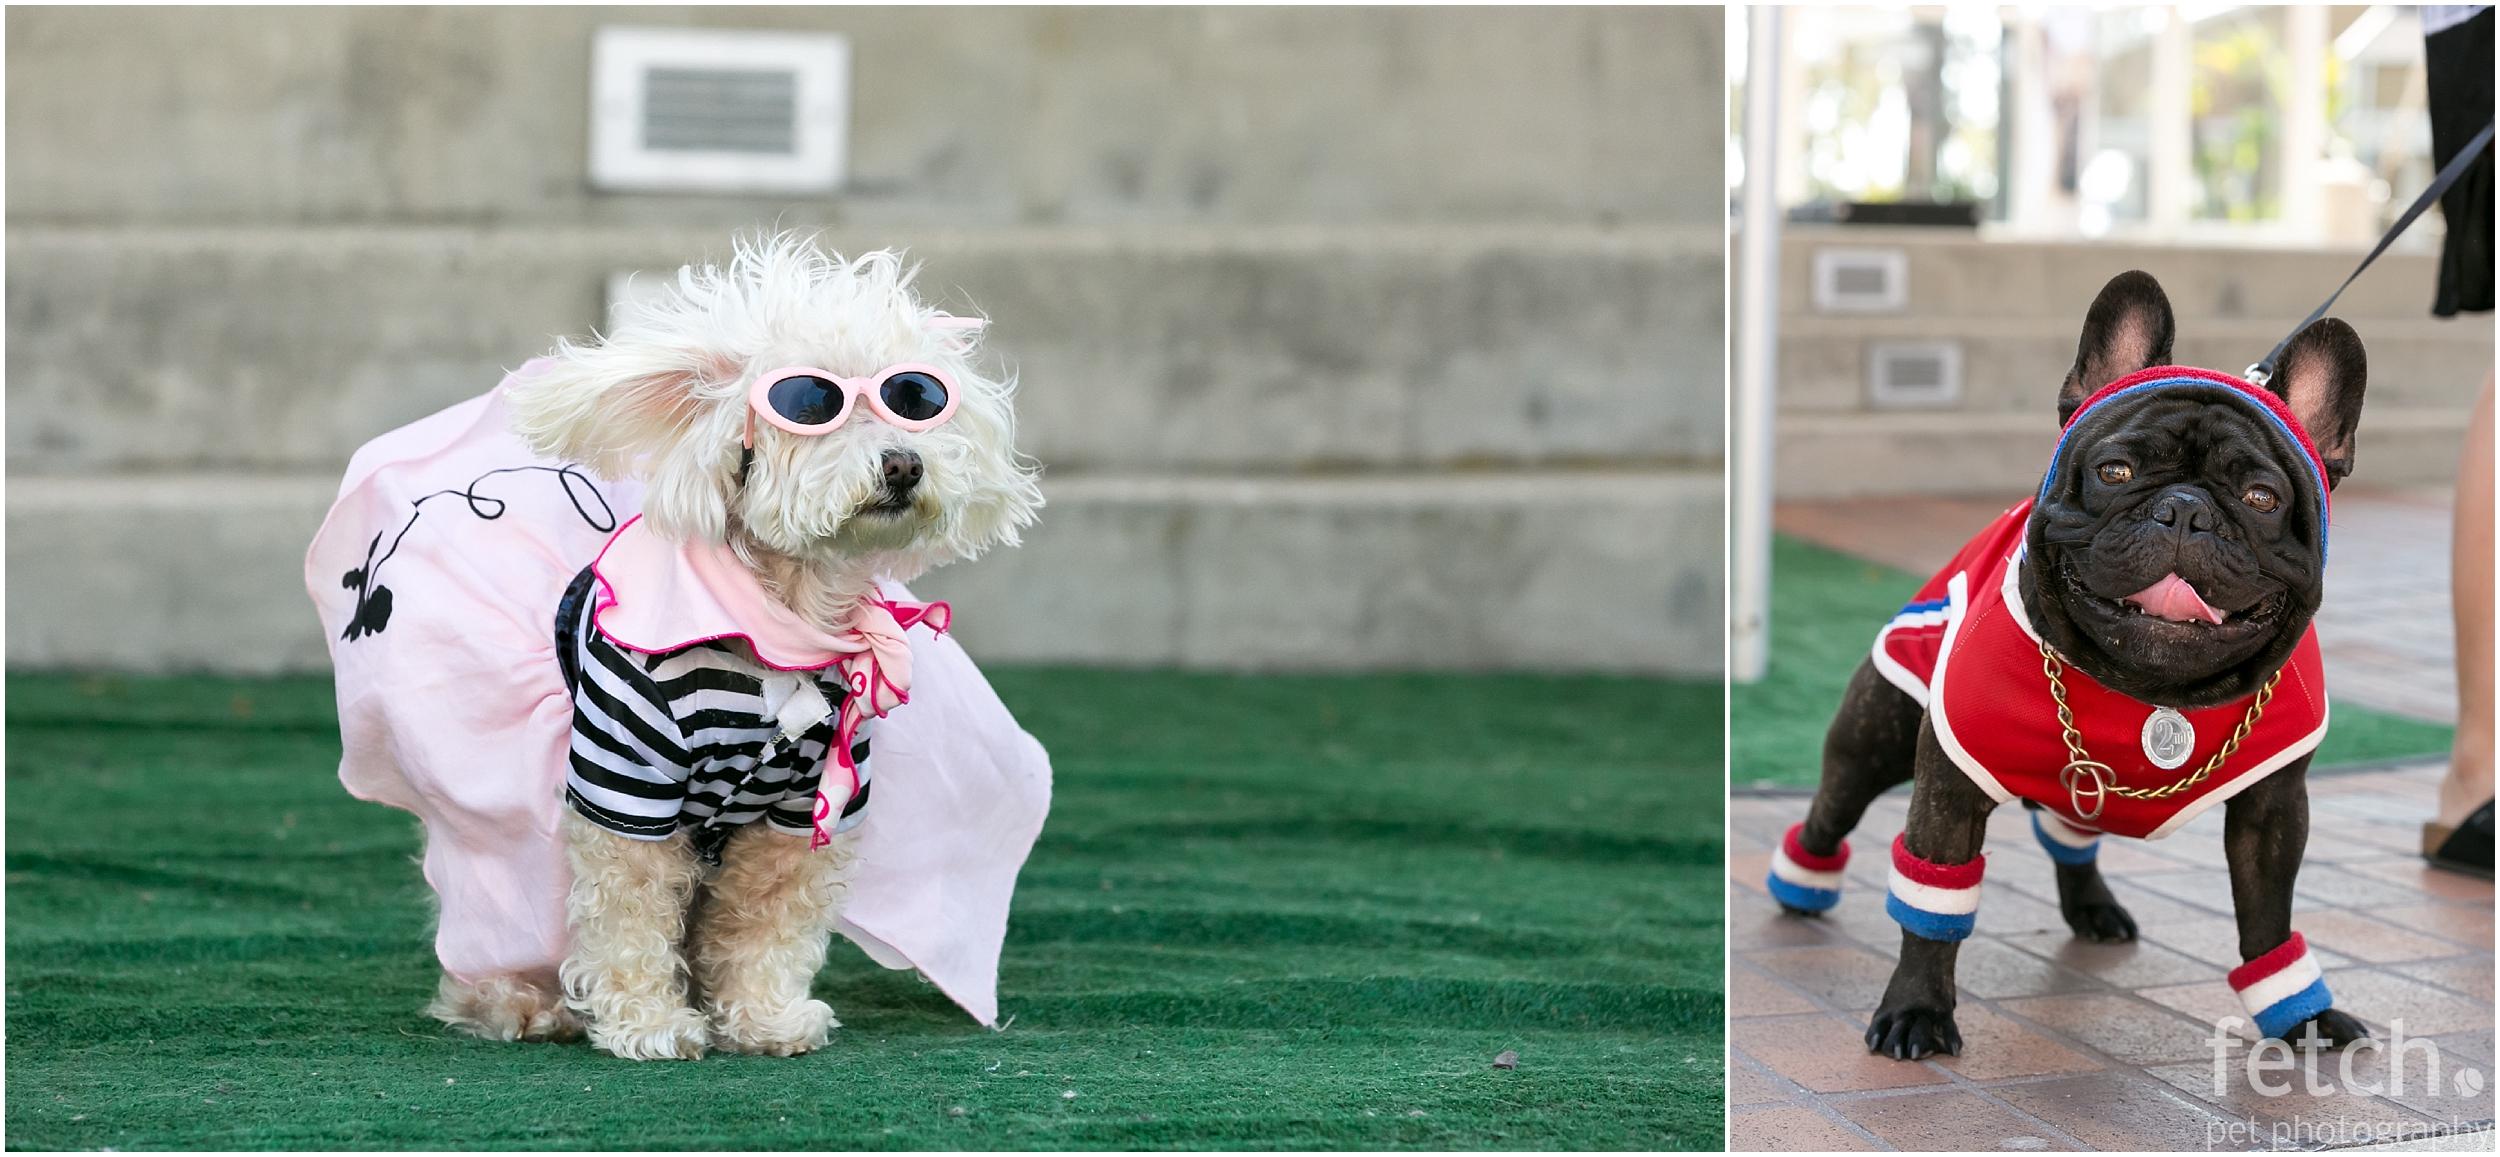 cute-dog-costume-contest